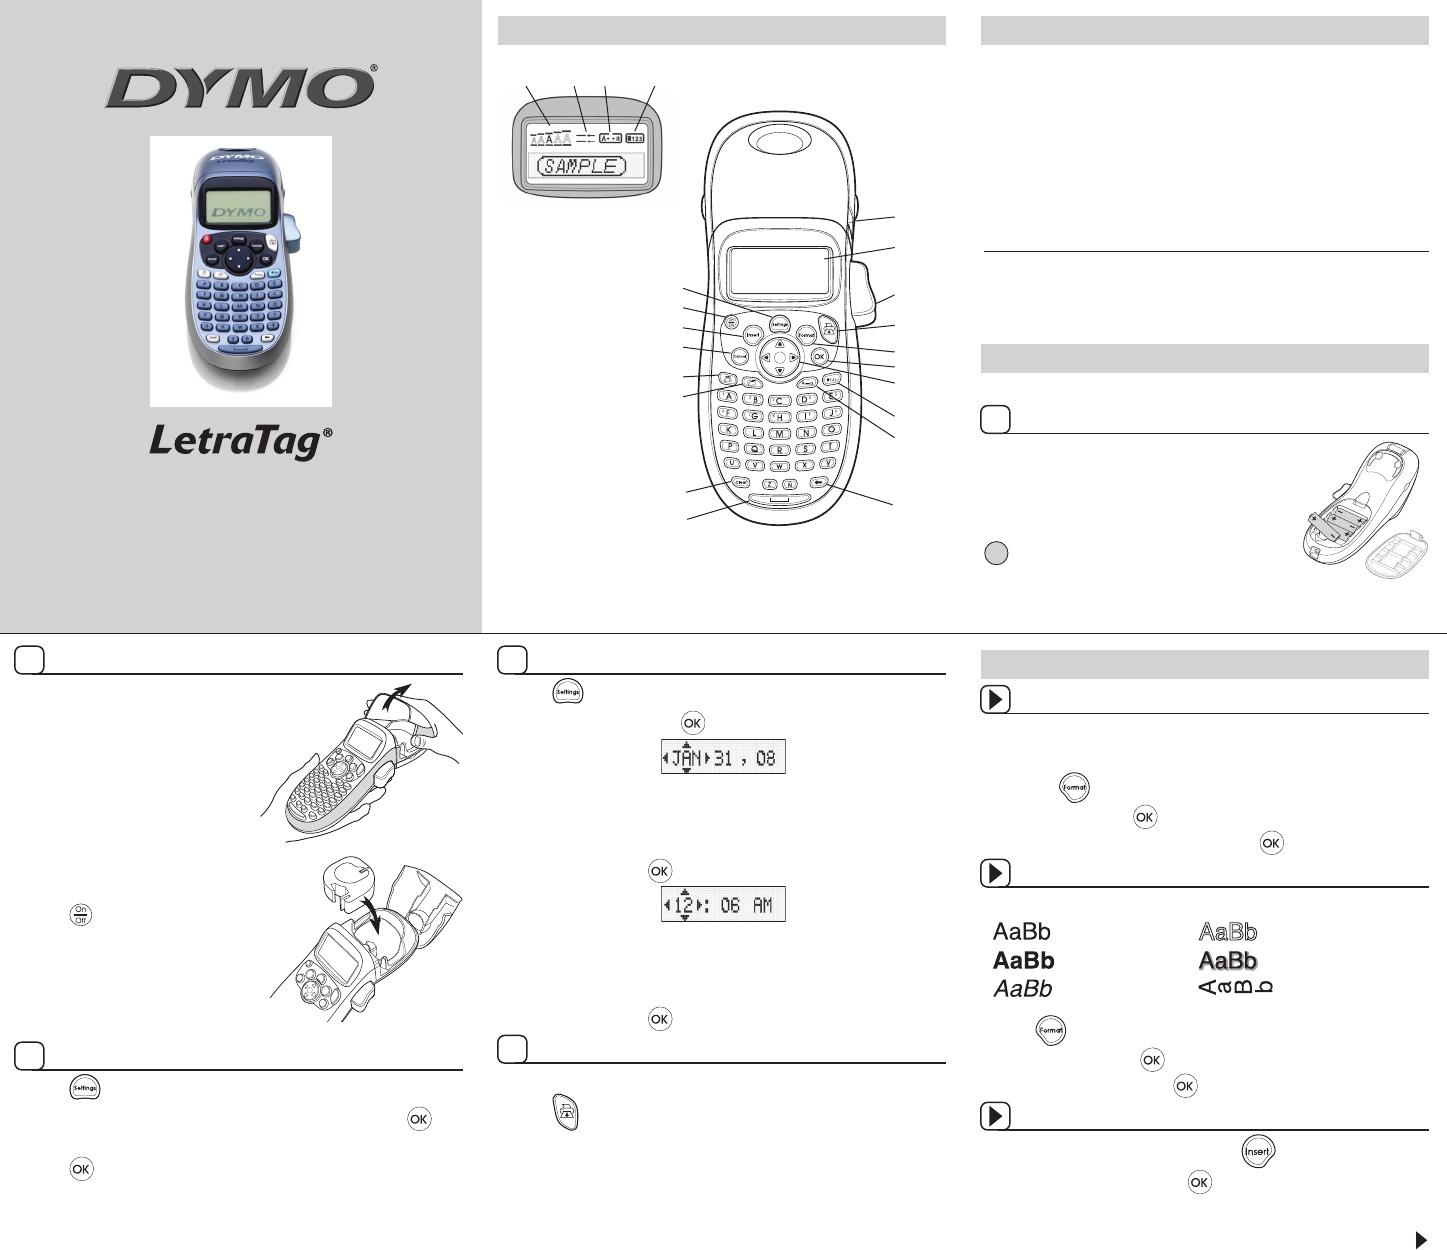 Handleiding Dymo Letratag Lt 100h Pagina 1 Van 2 English